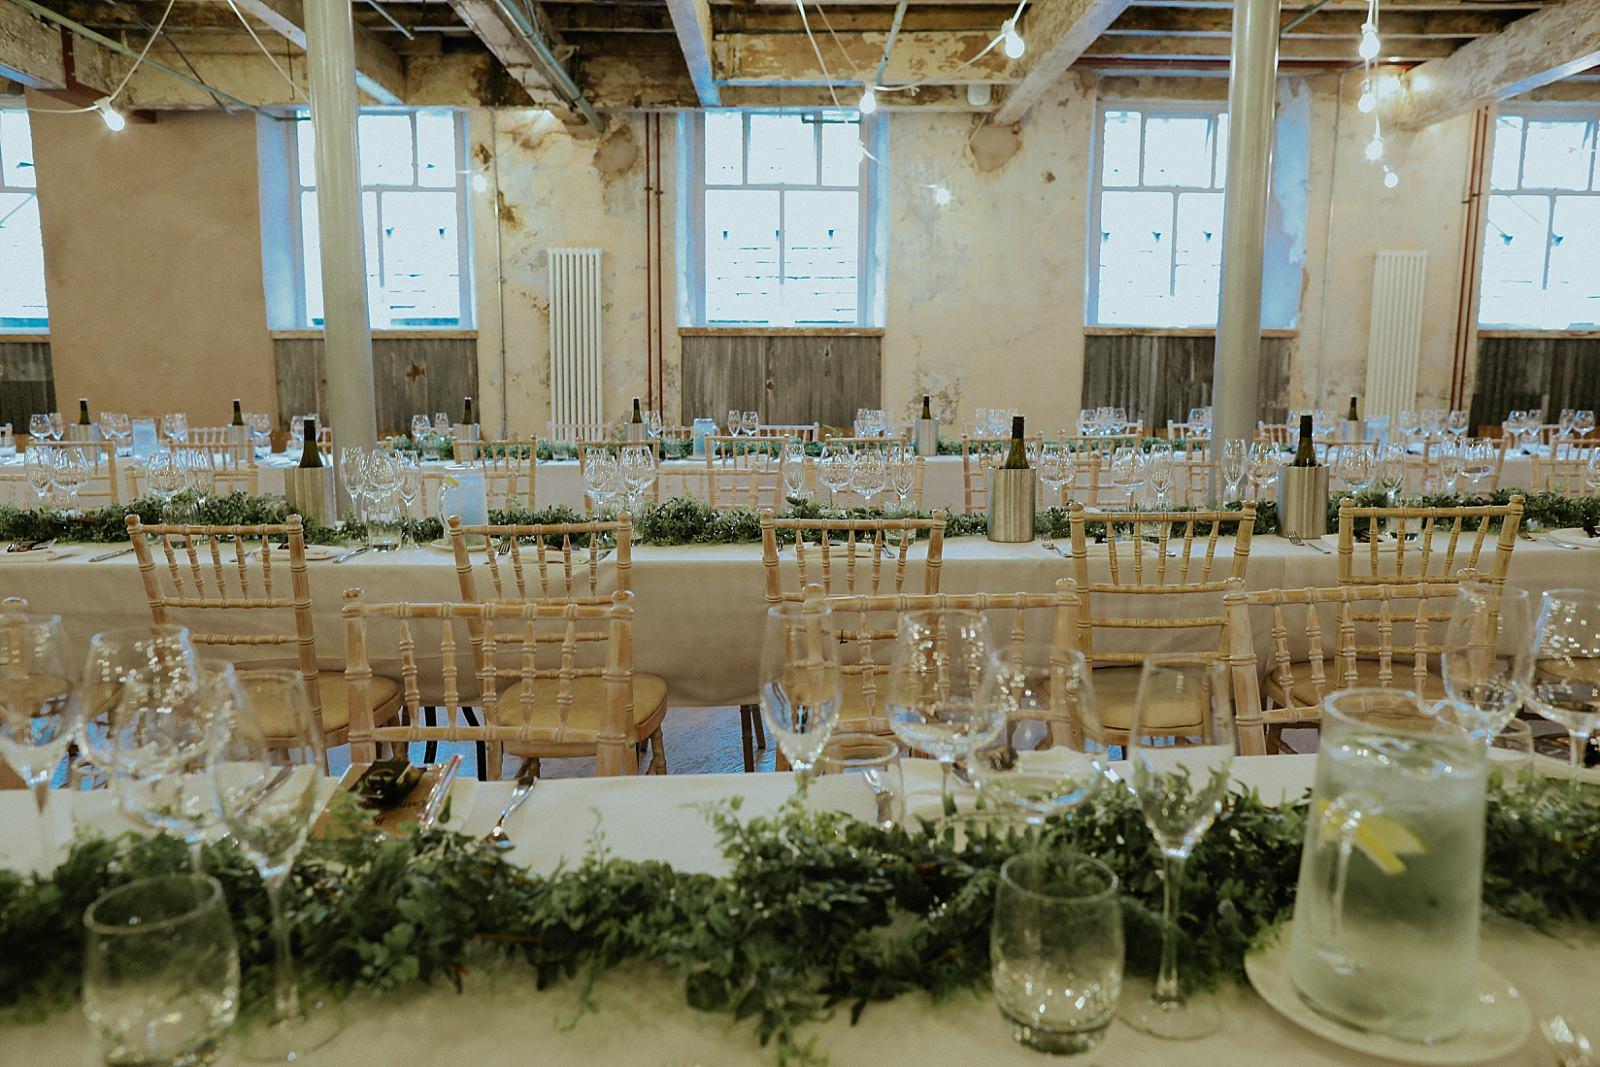 holmes mill wedding venue set out